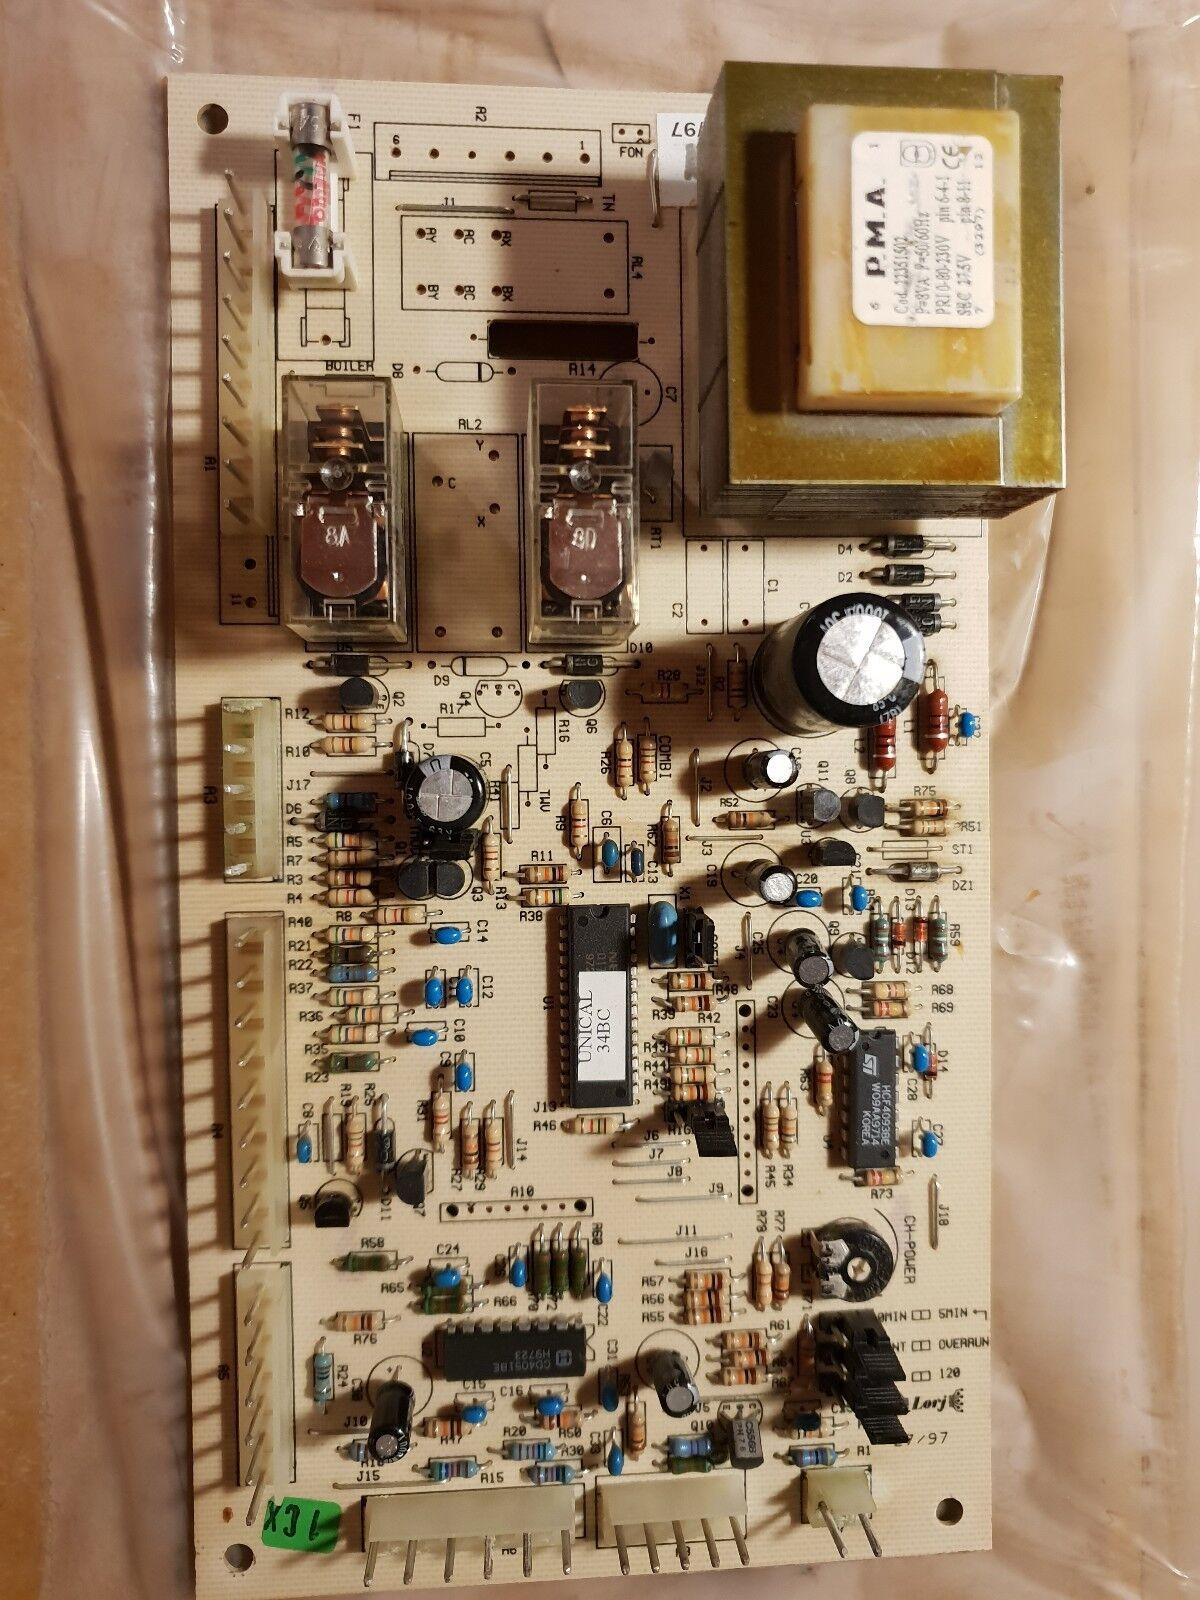 UNICAL Regelplatine SMD0141C                  unic 7300015